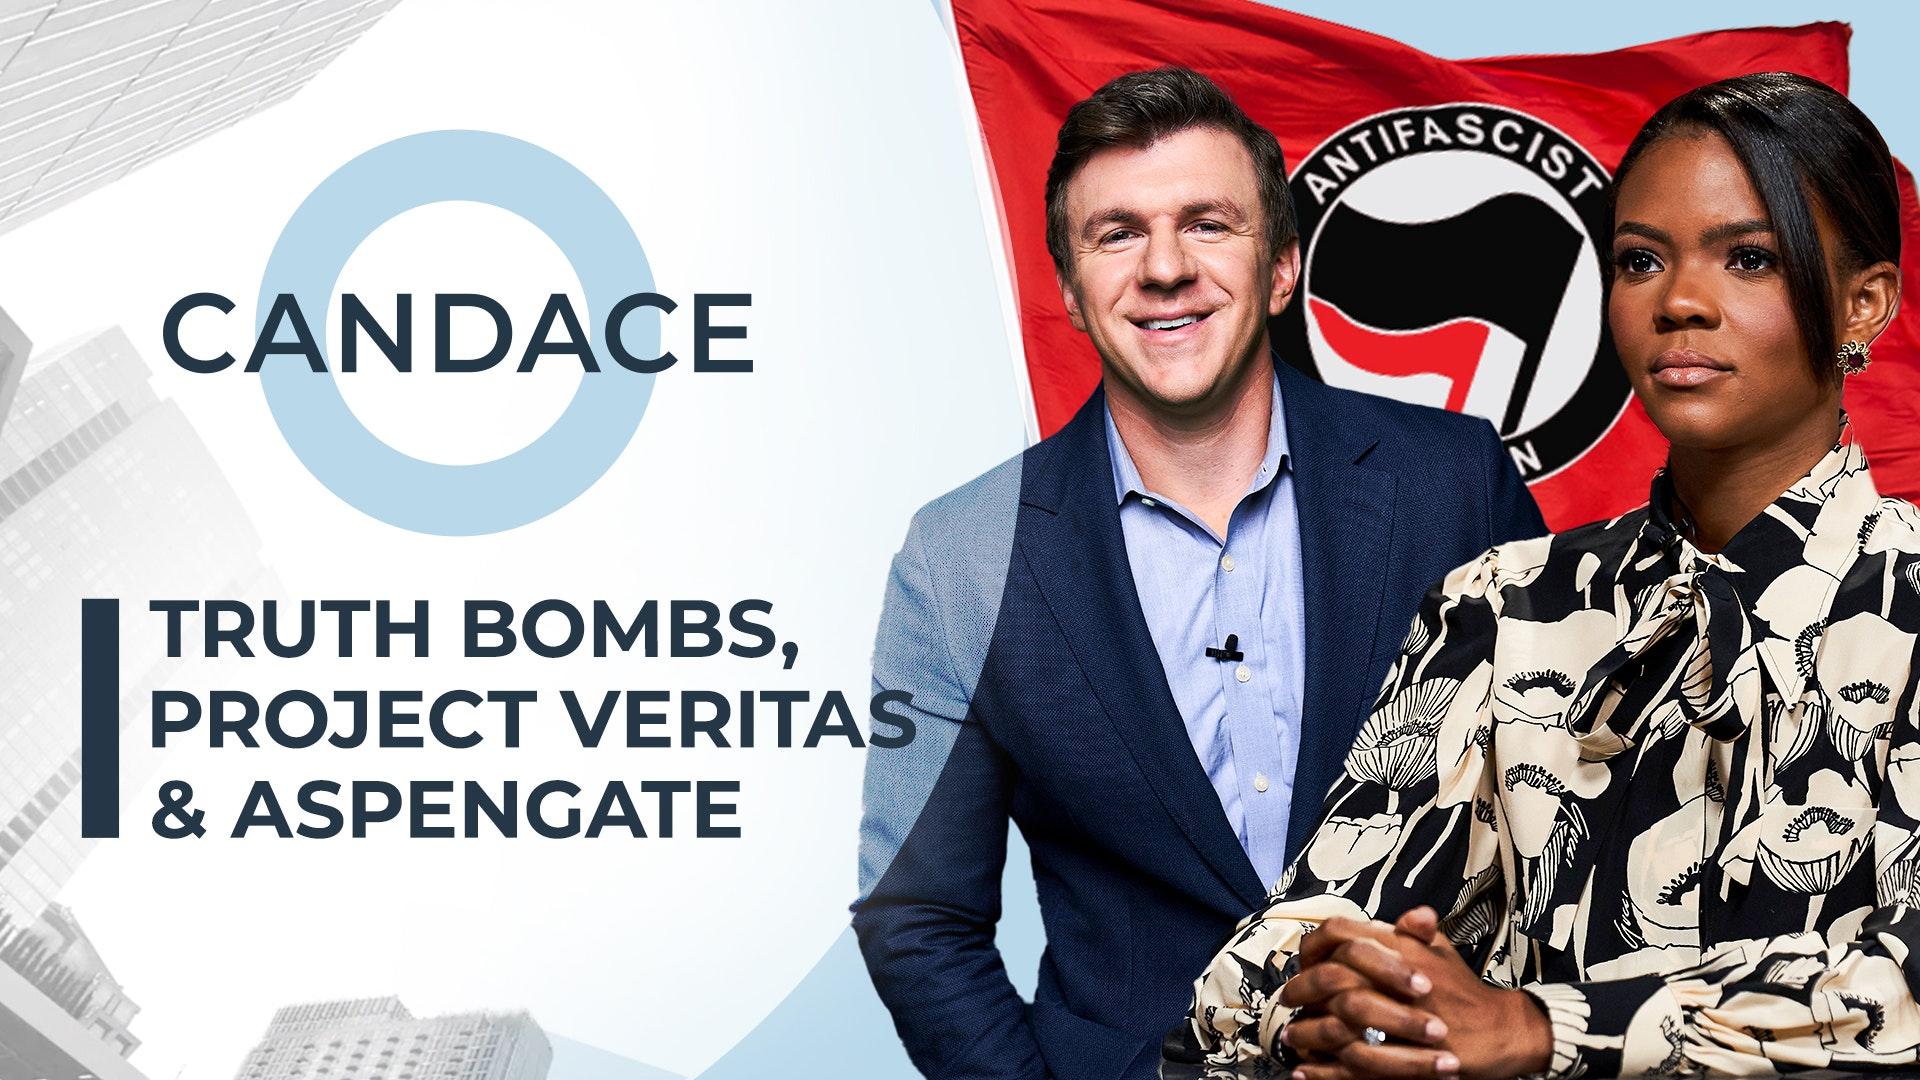 Episode 26 - Truth Bombs, Project Veritas & Aspengate